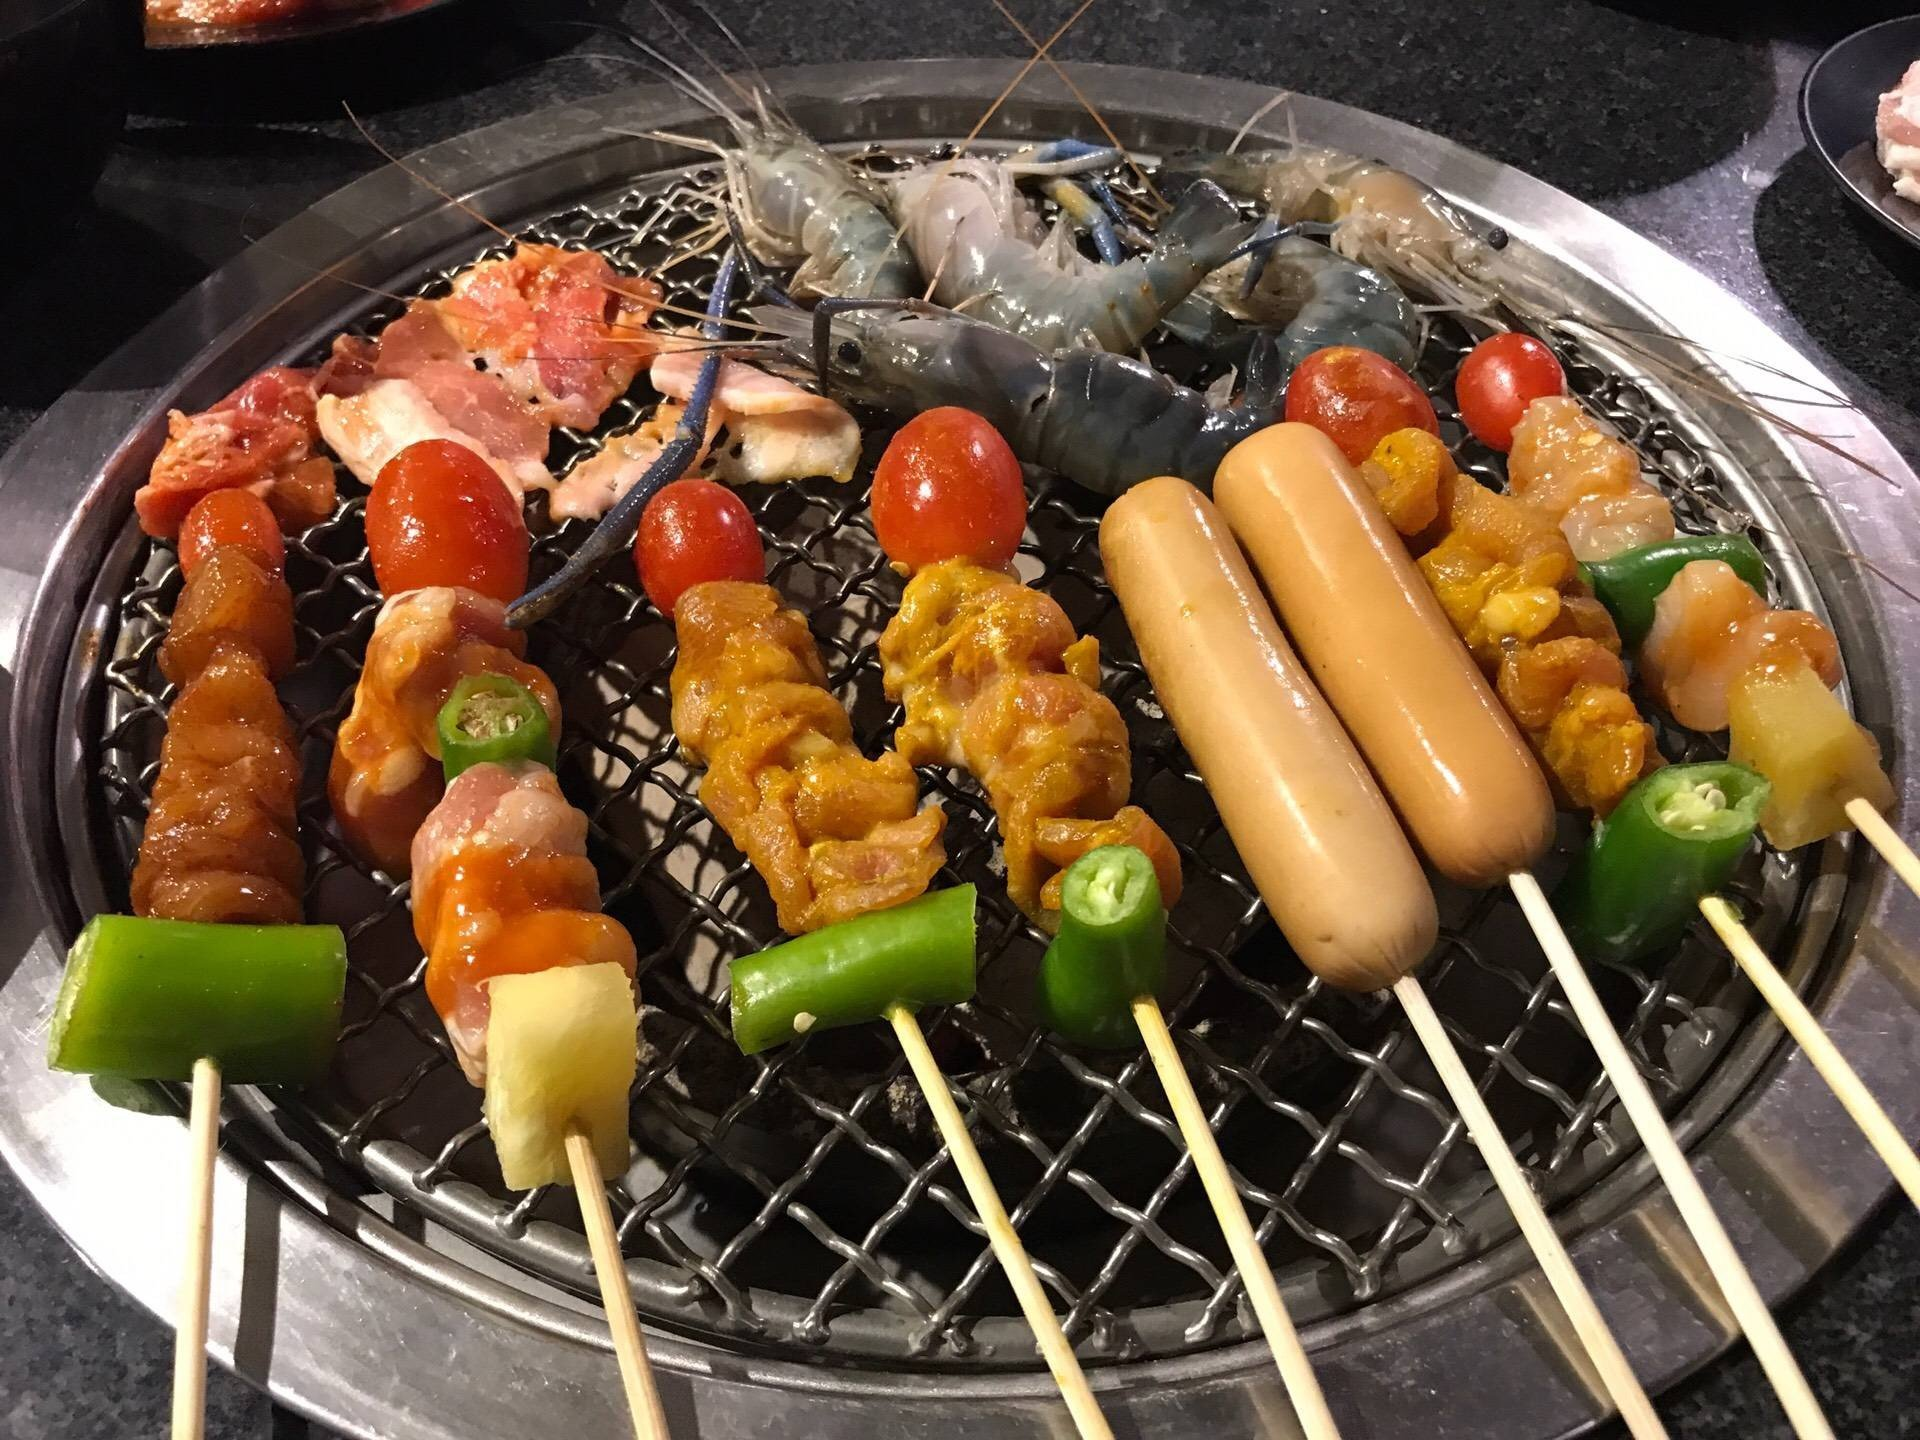 Buffet House Suki & BBQ เลียบคลองทวีวัฒนา